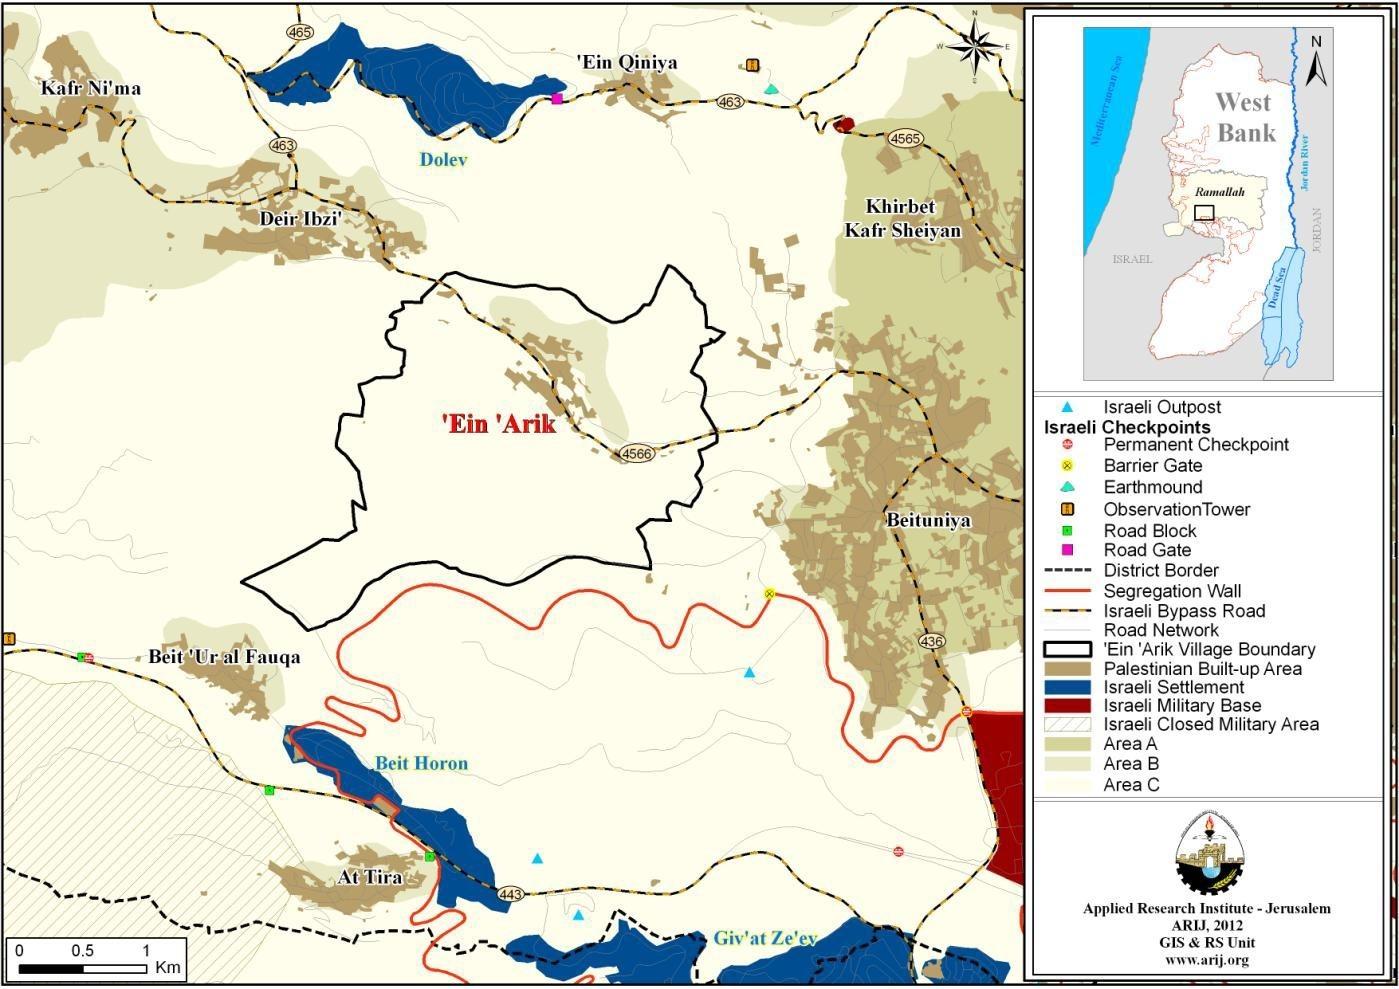 Map 1: 'Ein 'Arik location and borders